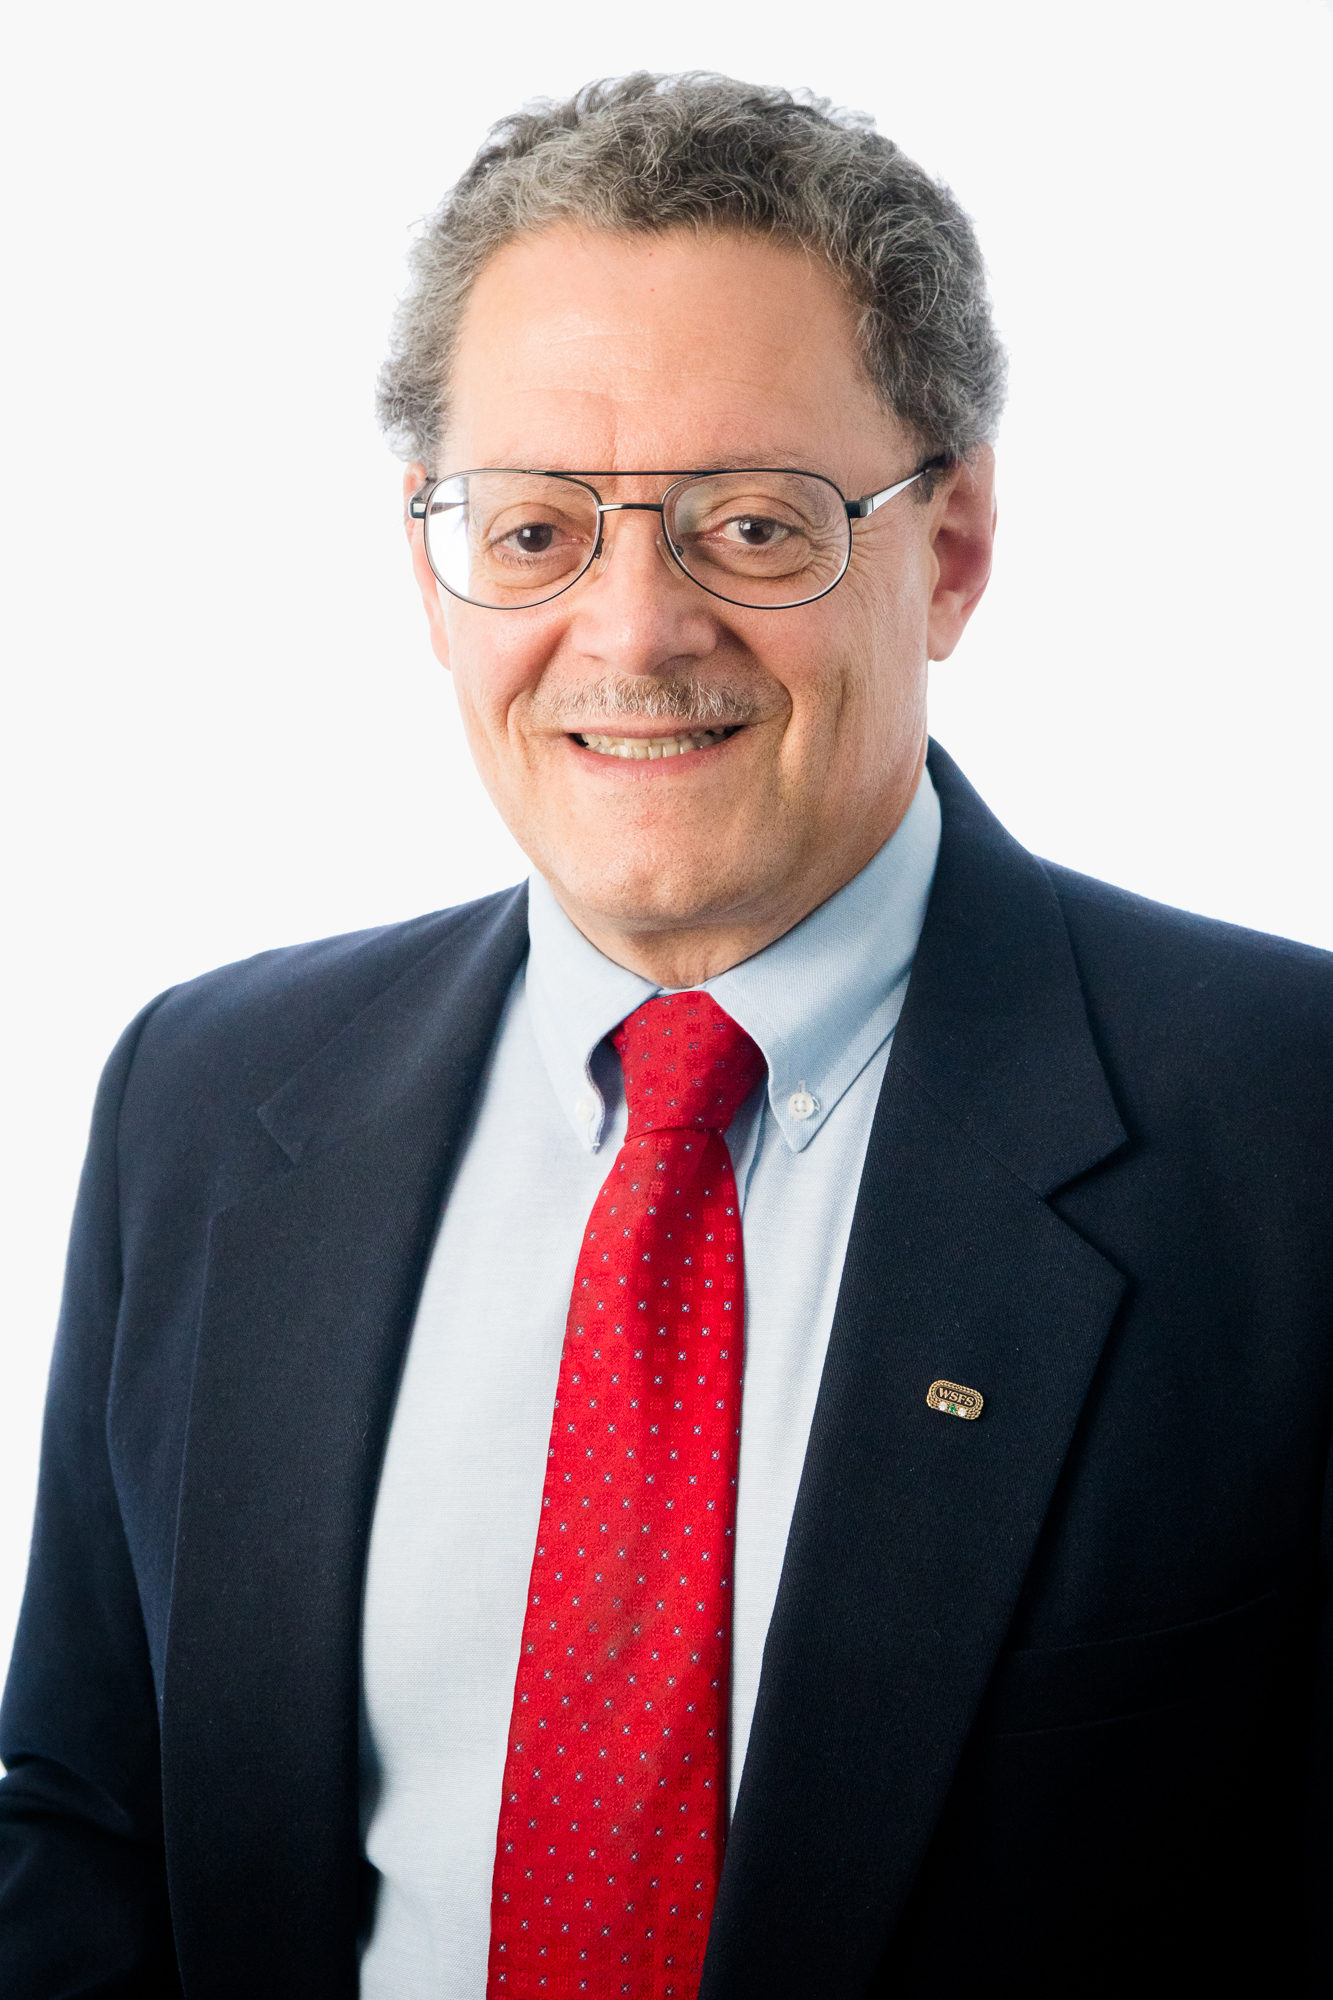 Jim Lucianetti